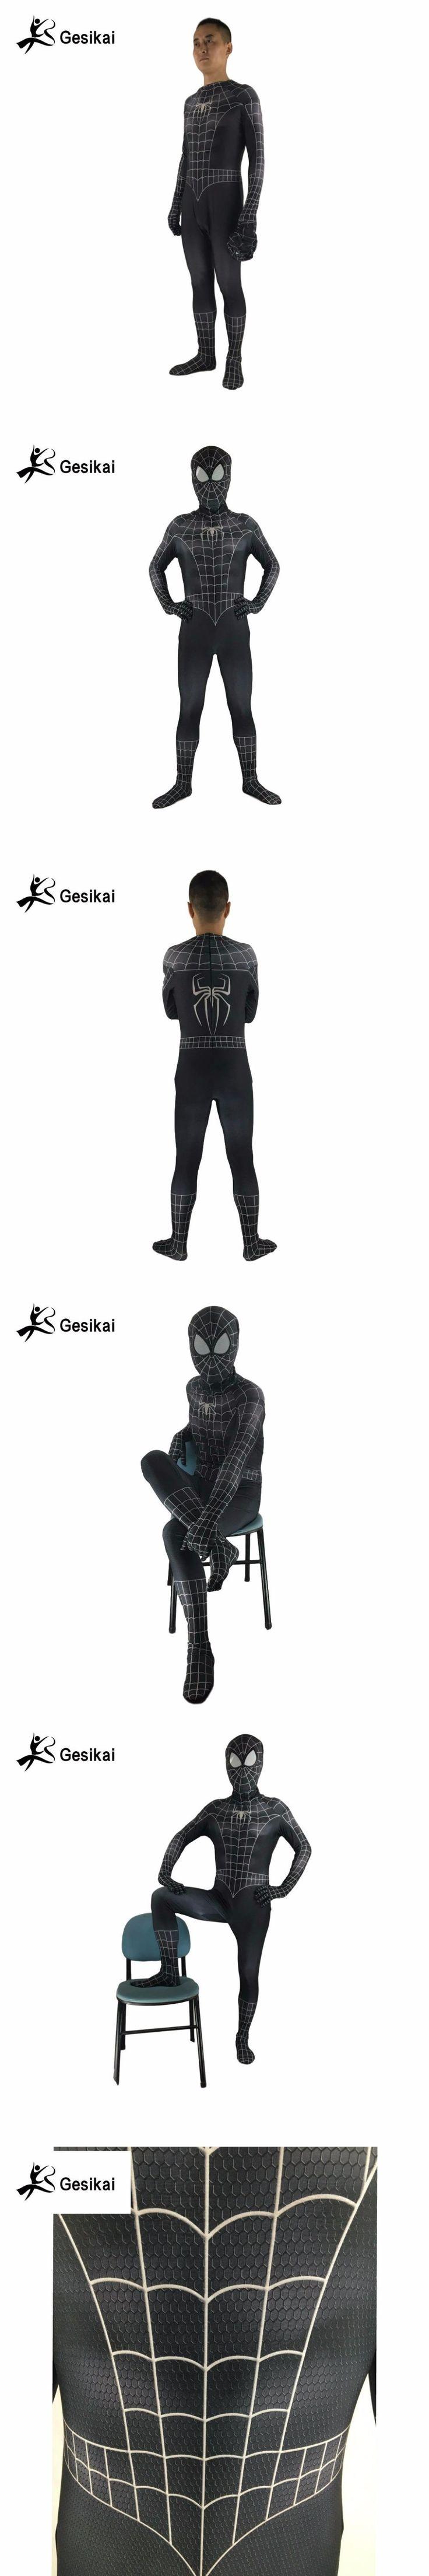 Halloween costume spiderman costume 3D Printing spider-man costumes cosplay spandex zentai suit S-3XL